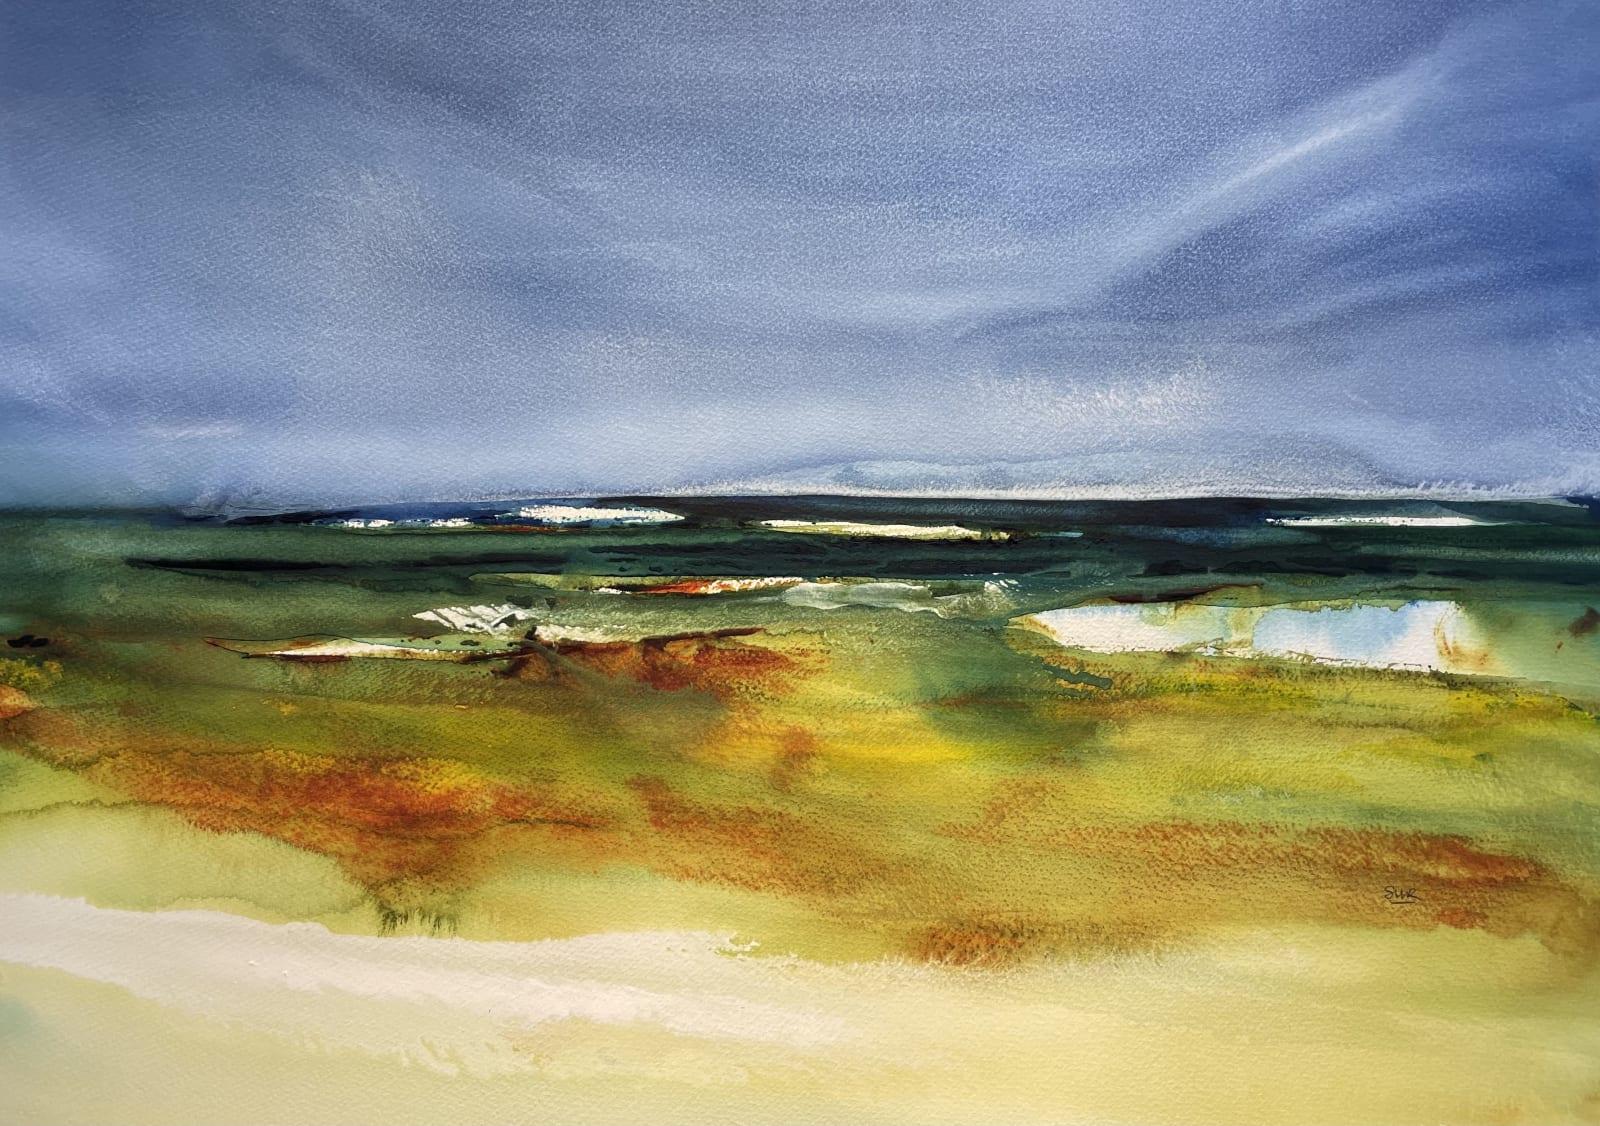 Stephen Redpath, Looking Inland, Sutherland, 2021